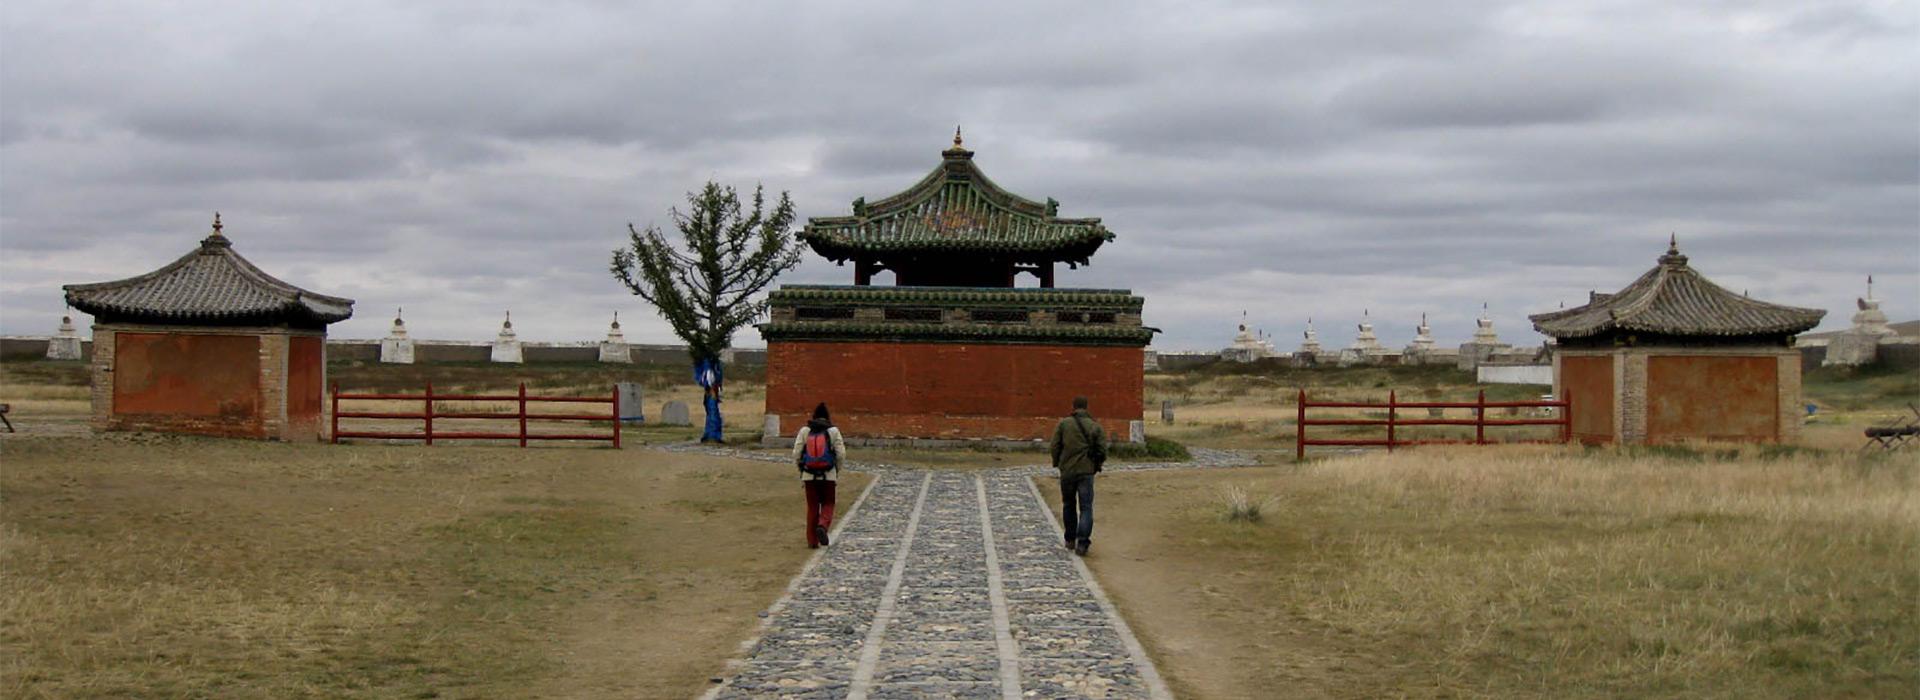 erdenezuu-monasteries